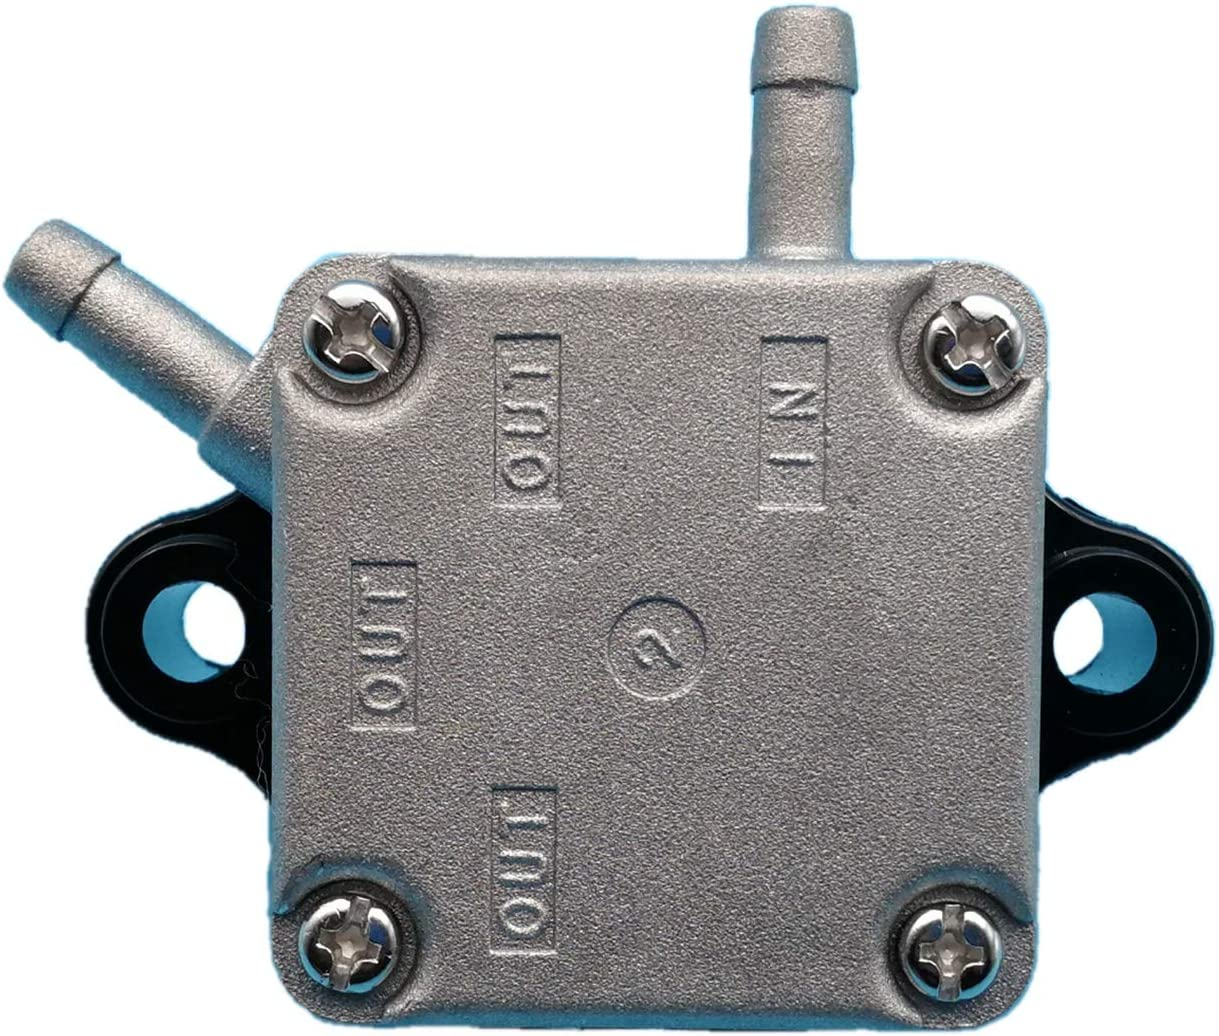 Tuzliufi Replace Fuel Pump Yamaha Mercury Parsun HDX Makara 4-Stroke 2 Cylinders 9.9HP 13.5HP 15HP F15 F13.5 F9.9 Gasoline Outboard Motor 66M-24410-10-00 835389T1 835389T02 835389A2 F15-07140000 Z105